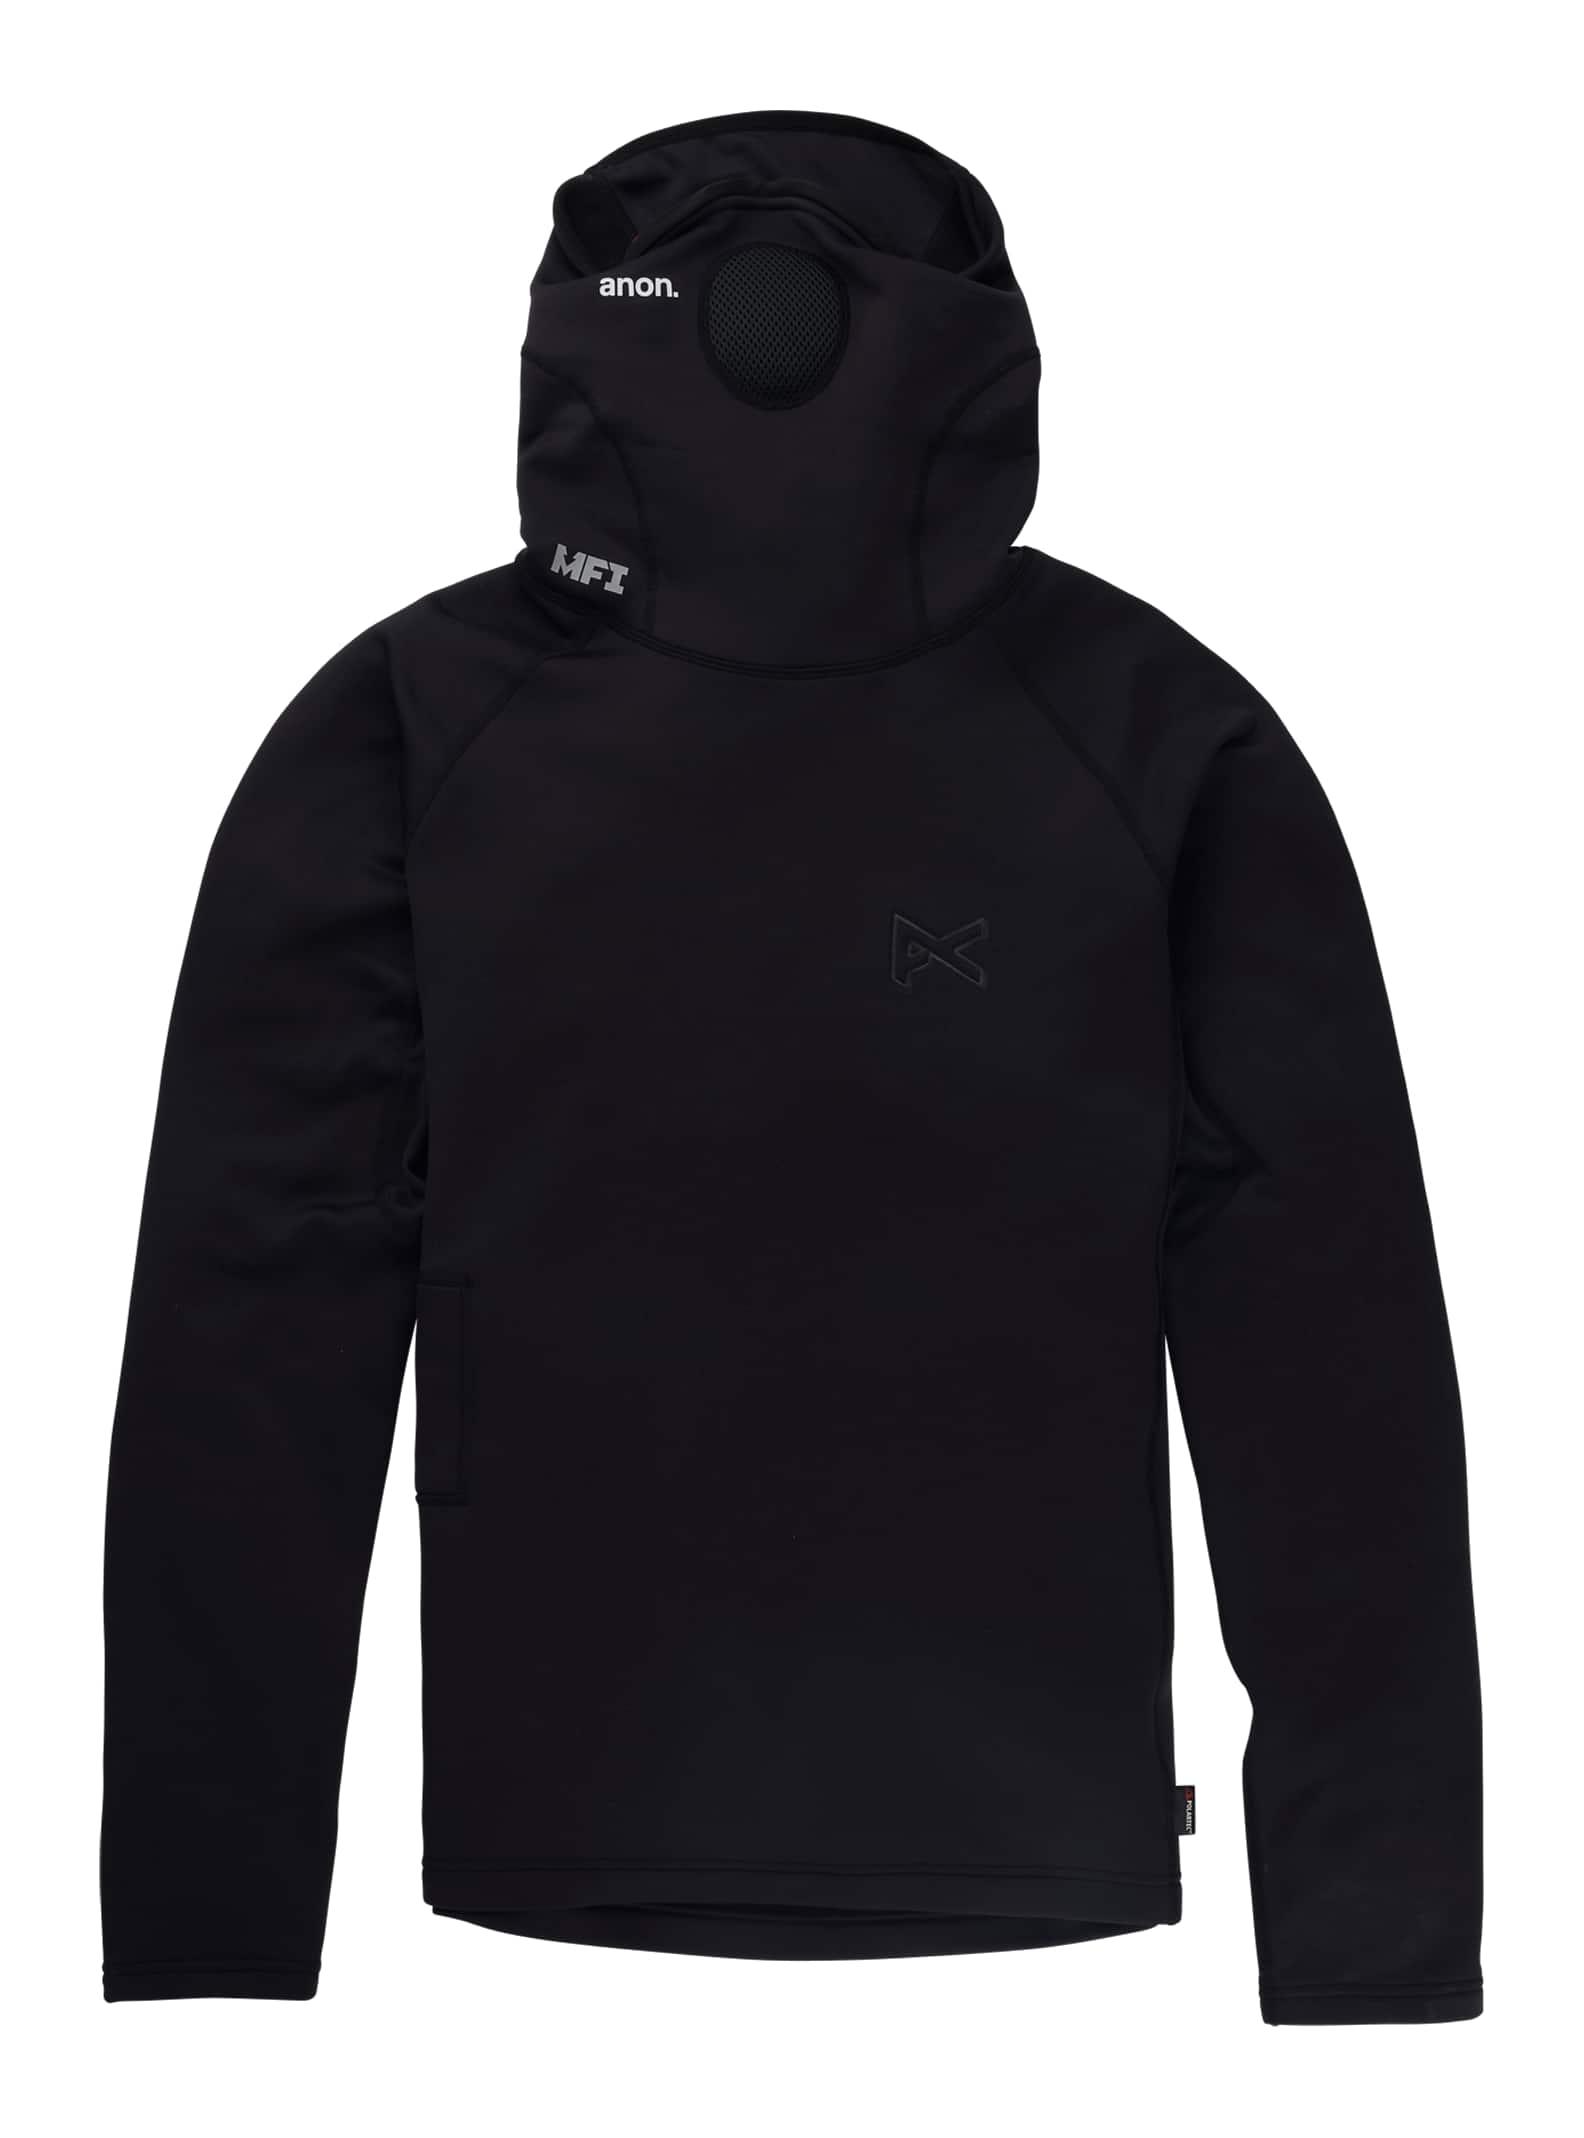 Anon MFI® Power Dry® långärmad tröja, XS